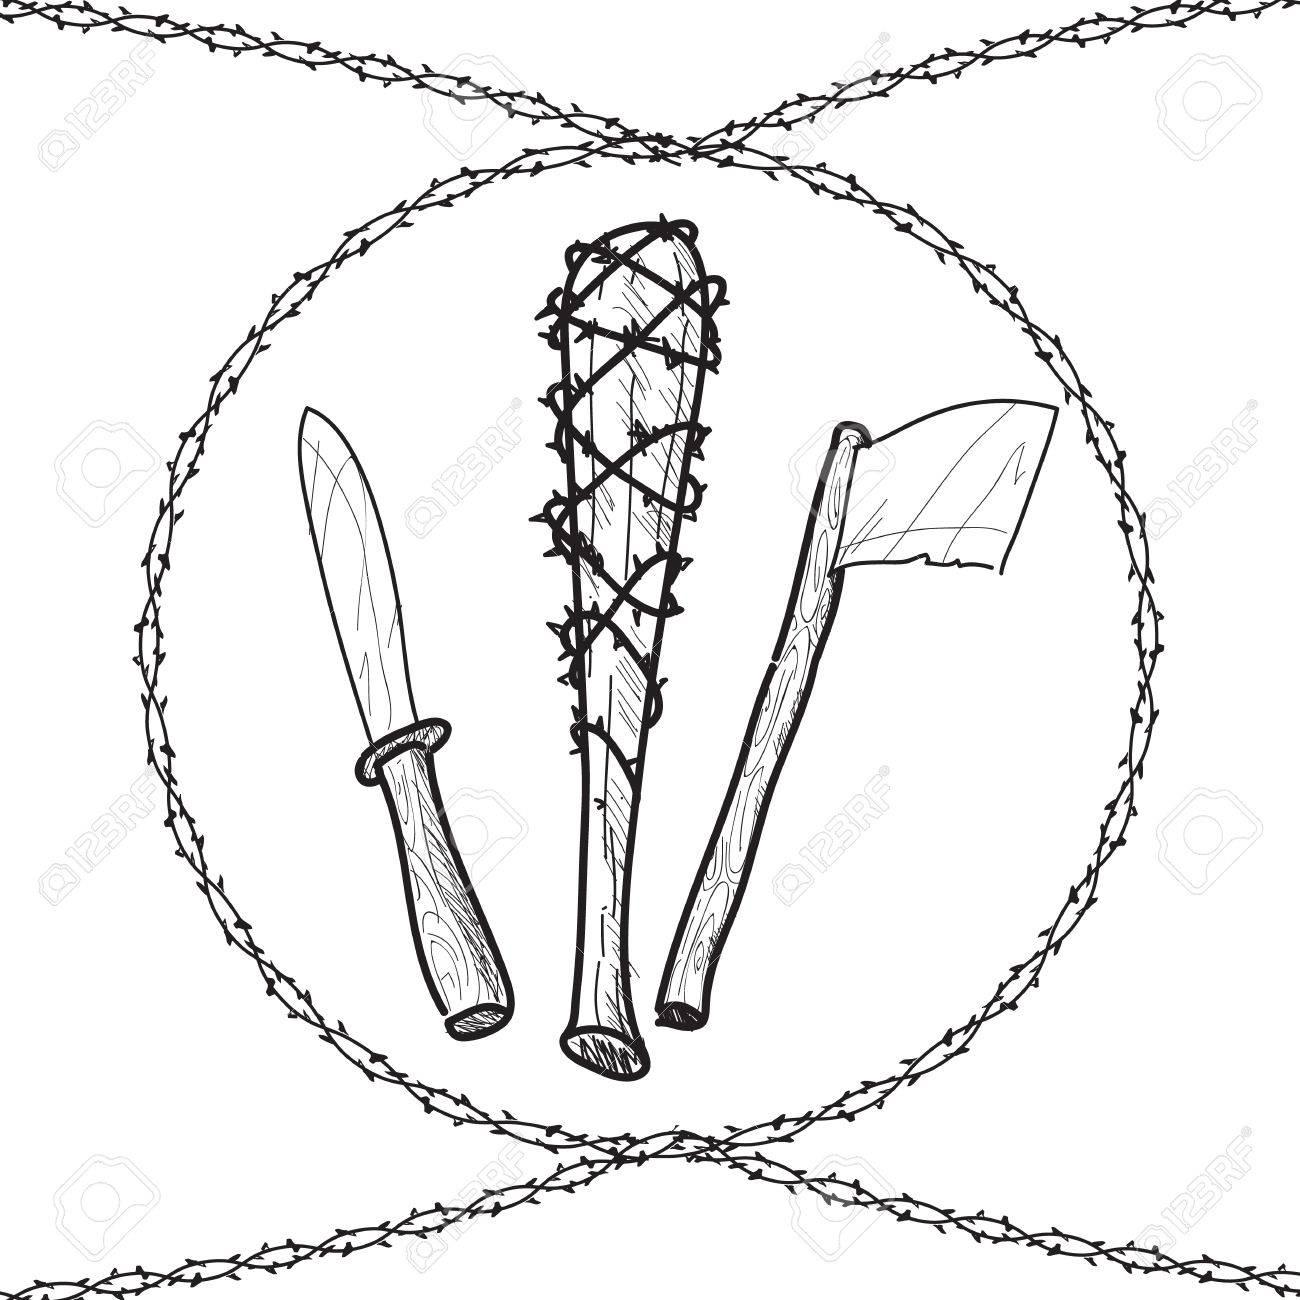 1300x1300 Knives Axes Baseball Wire Barb Bats Sketch Illustration Royalty